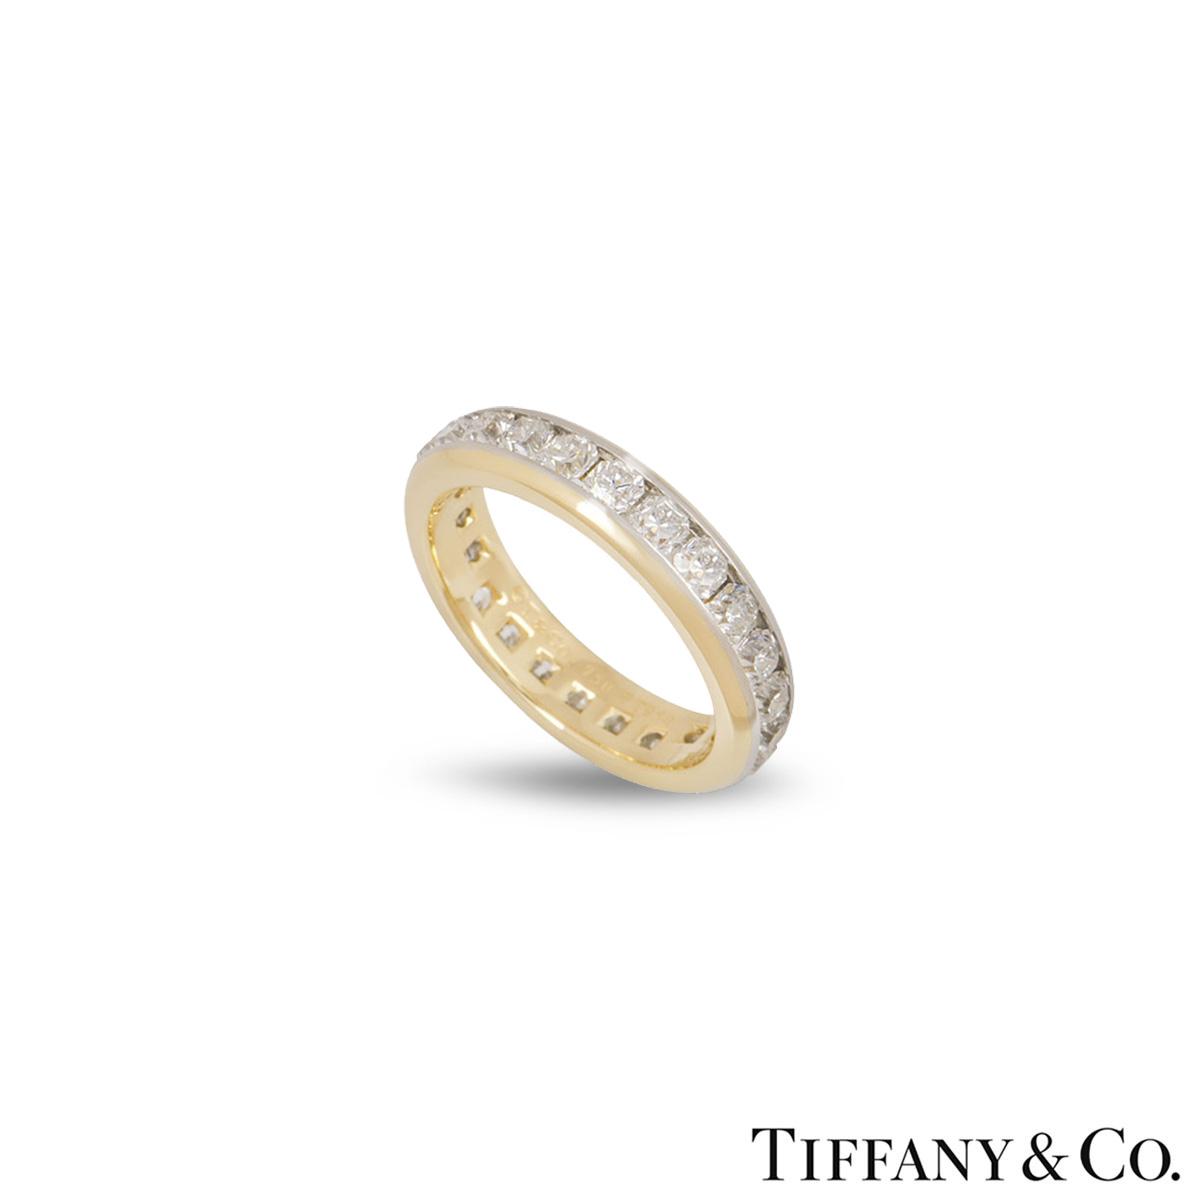 Tiffany & Co. Lucida Full Diamond Eternity Ring